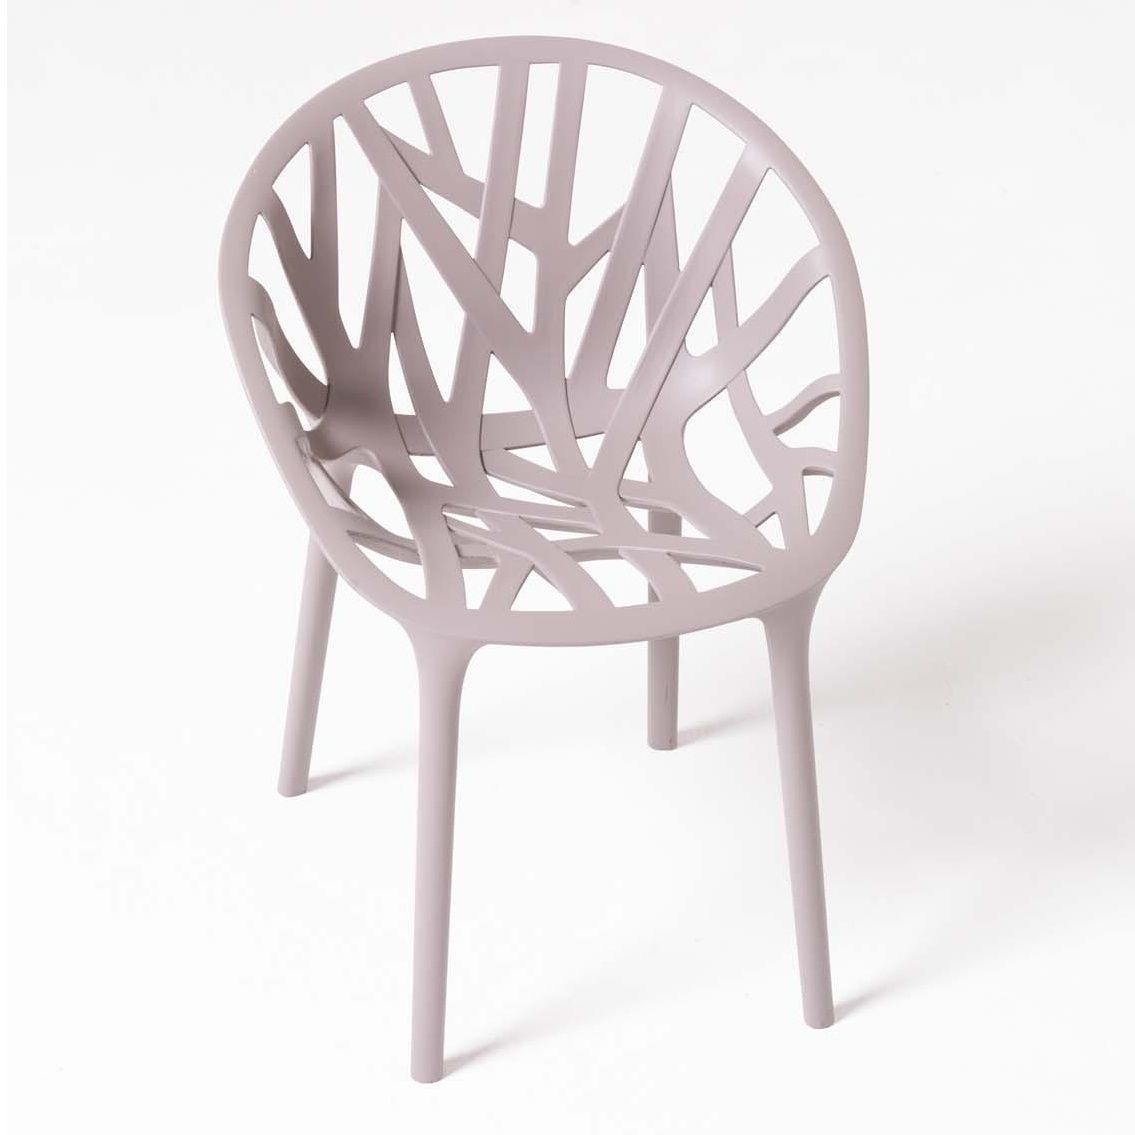 Vegetal chair vitra - Chaise vegetal vitra ...